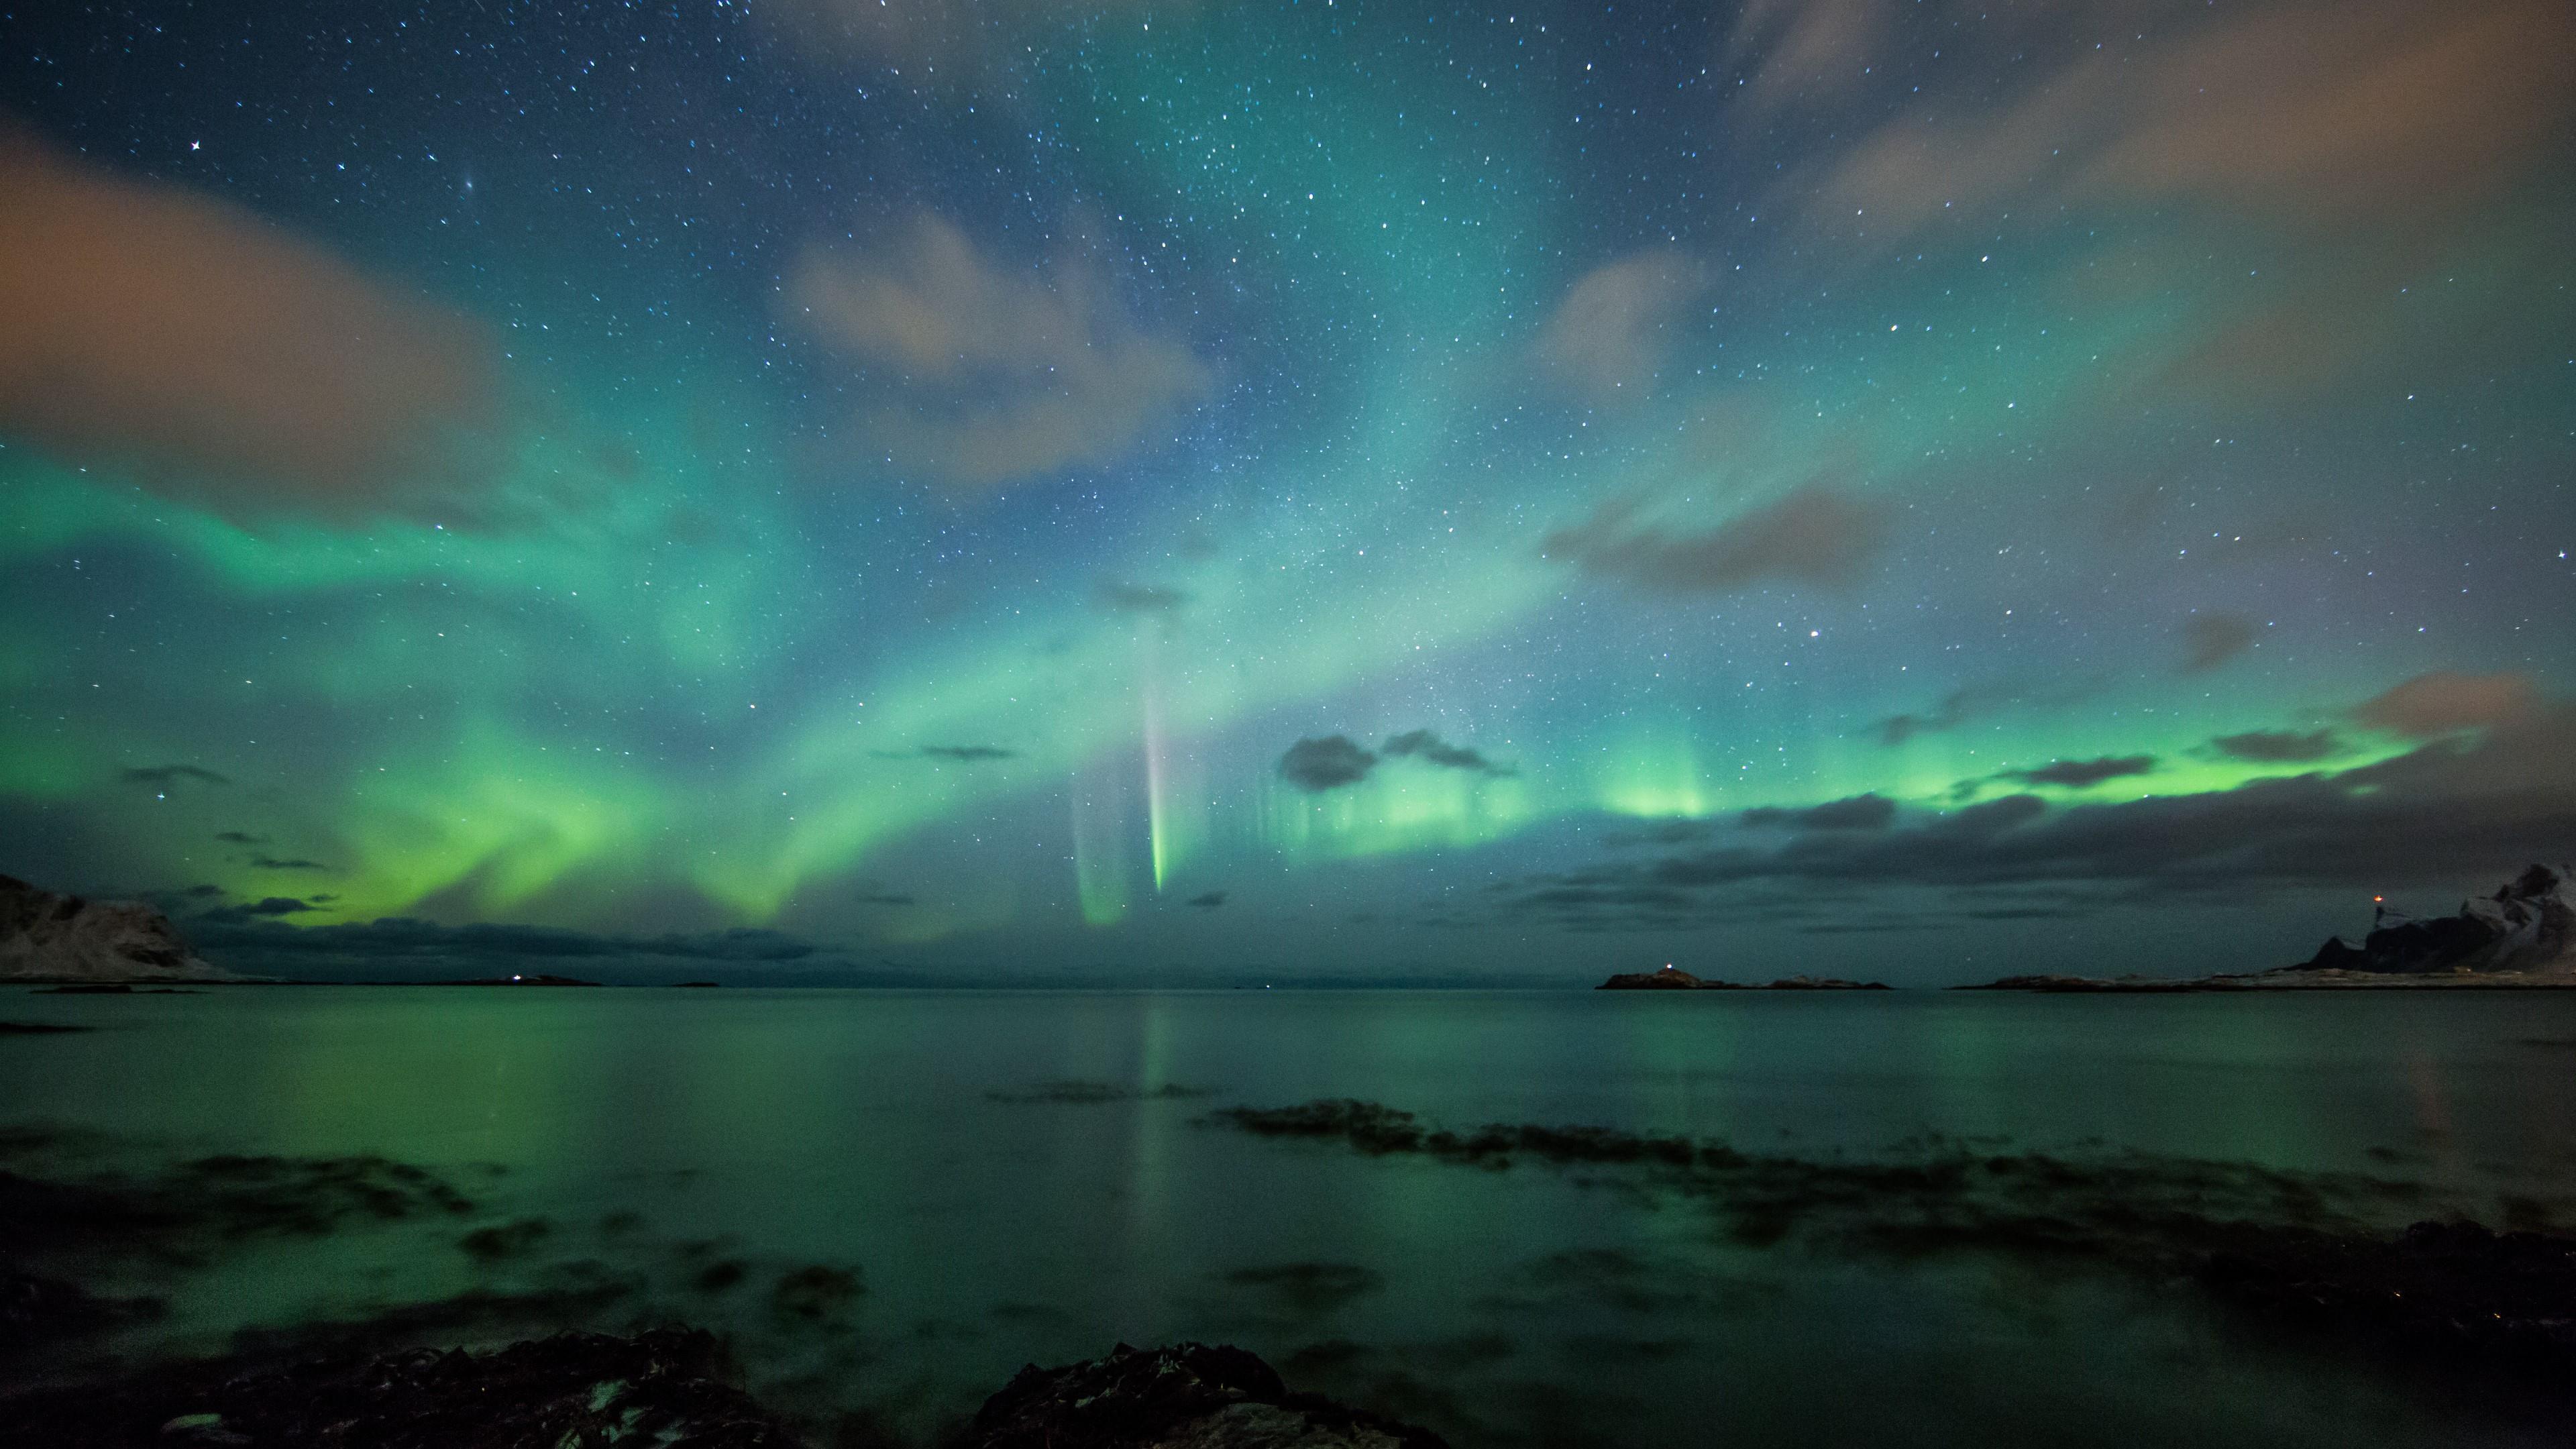 Green aurora borealis on the starry night sky wallpaper